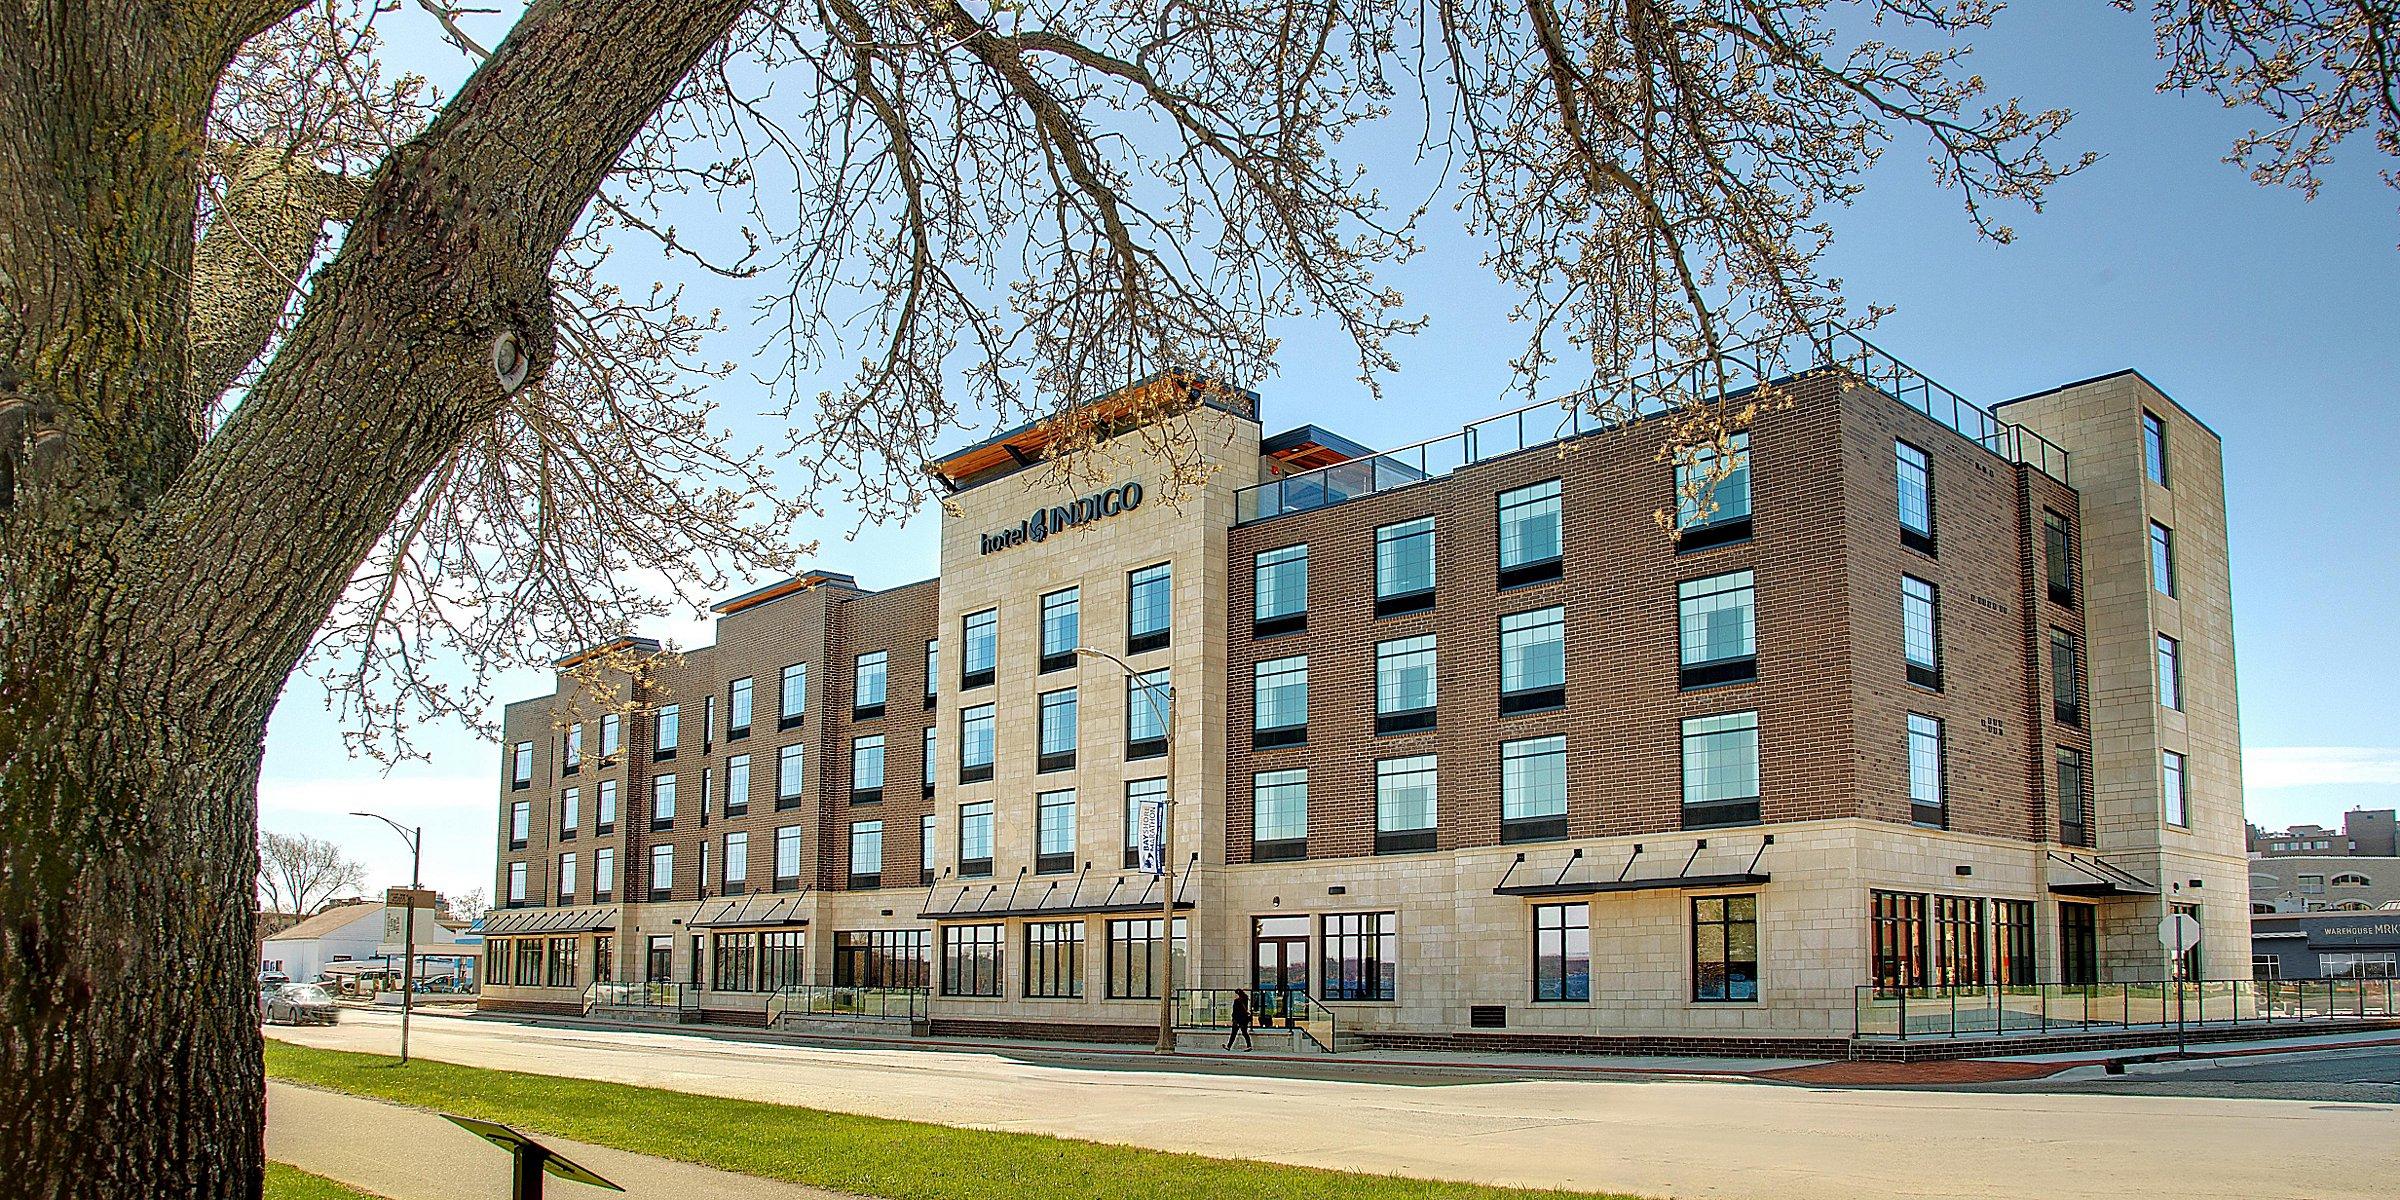 Hotel Indigo Traverse City, an IHG Hotel, West Grandview Parkway, Traverse City, MI, USA